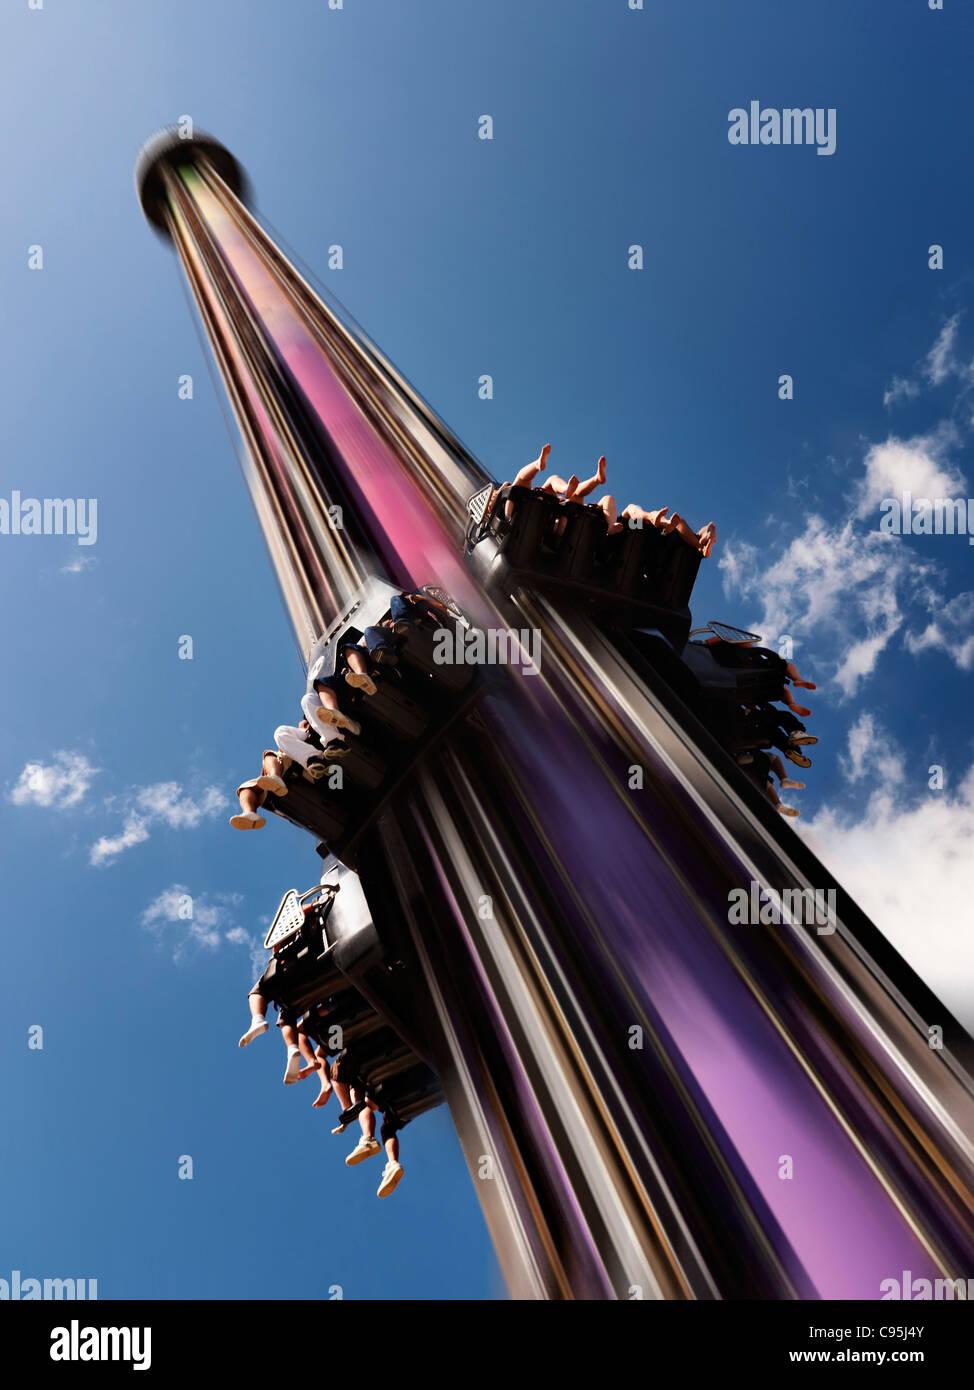 Drop Tower free fall thrill ride at Canada's Wonderland amusement park. Vaughan Ontario Canada. - Stock Image